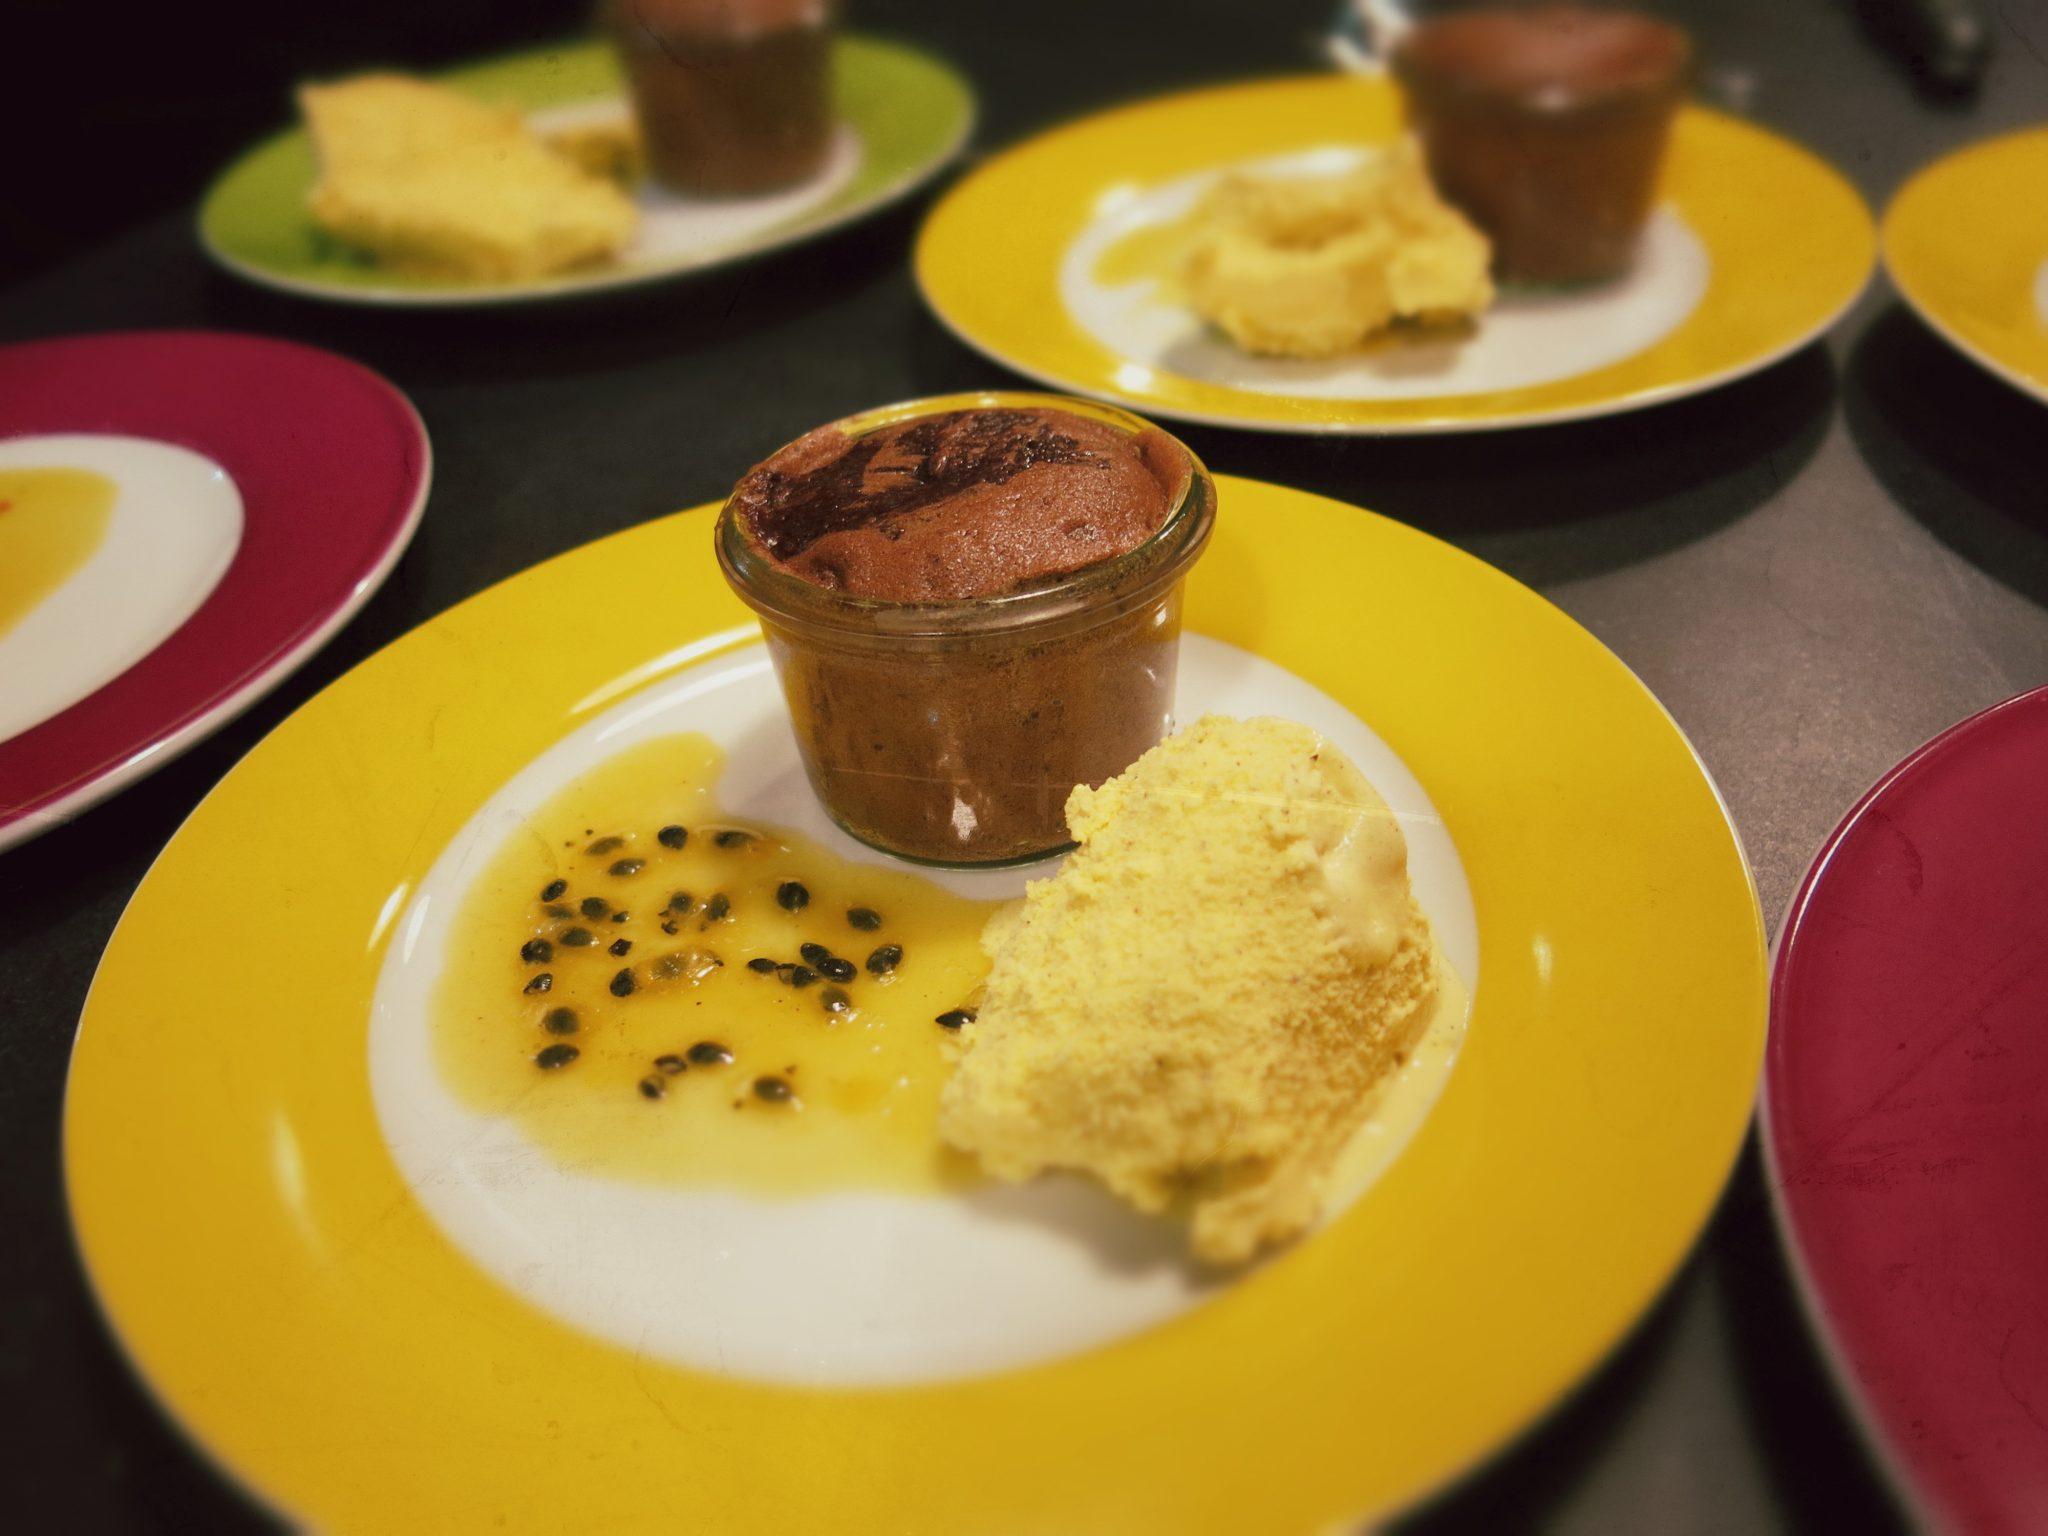 Lauwarmer Schokoladenkuchen